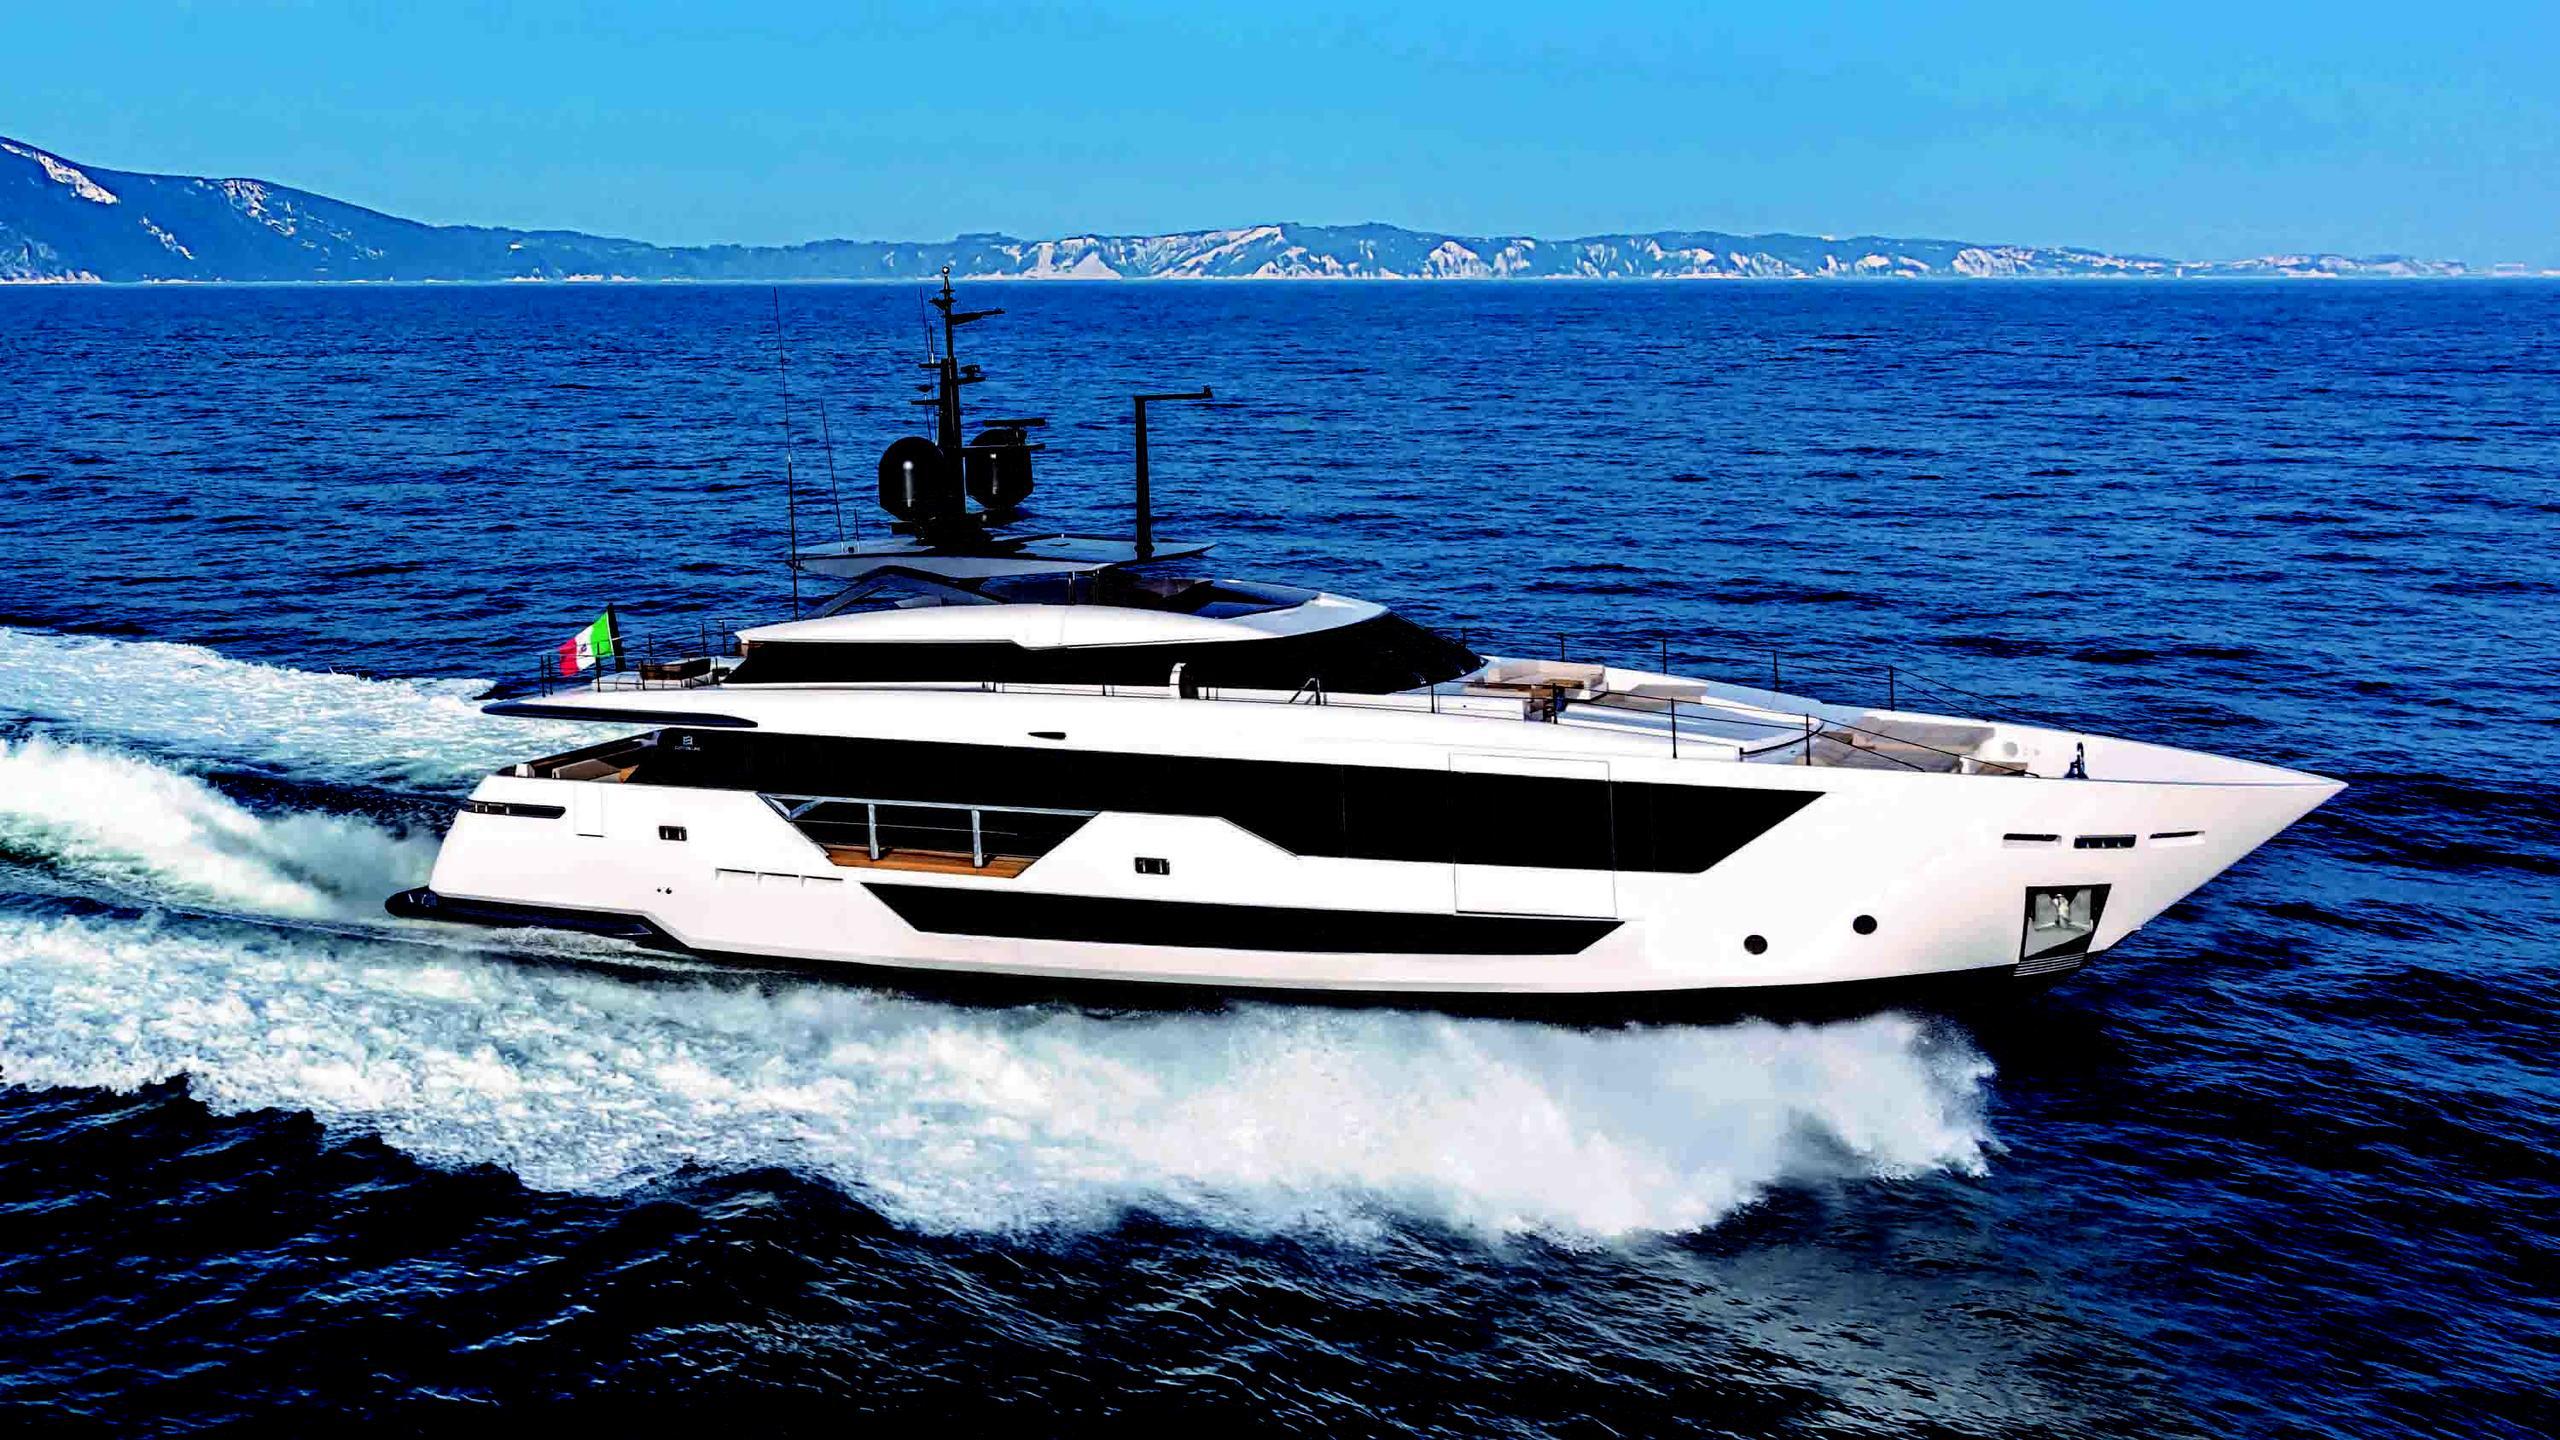 falcon-ca-motoryacht-ferretti-custom-line-106-33m-2020-half-profile-sistership